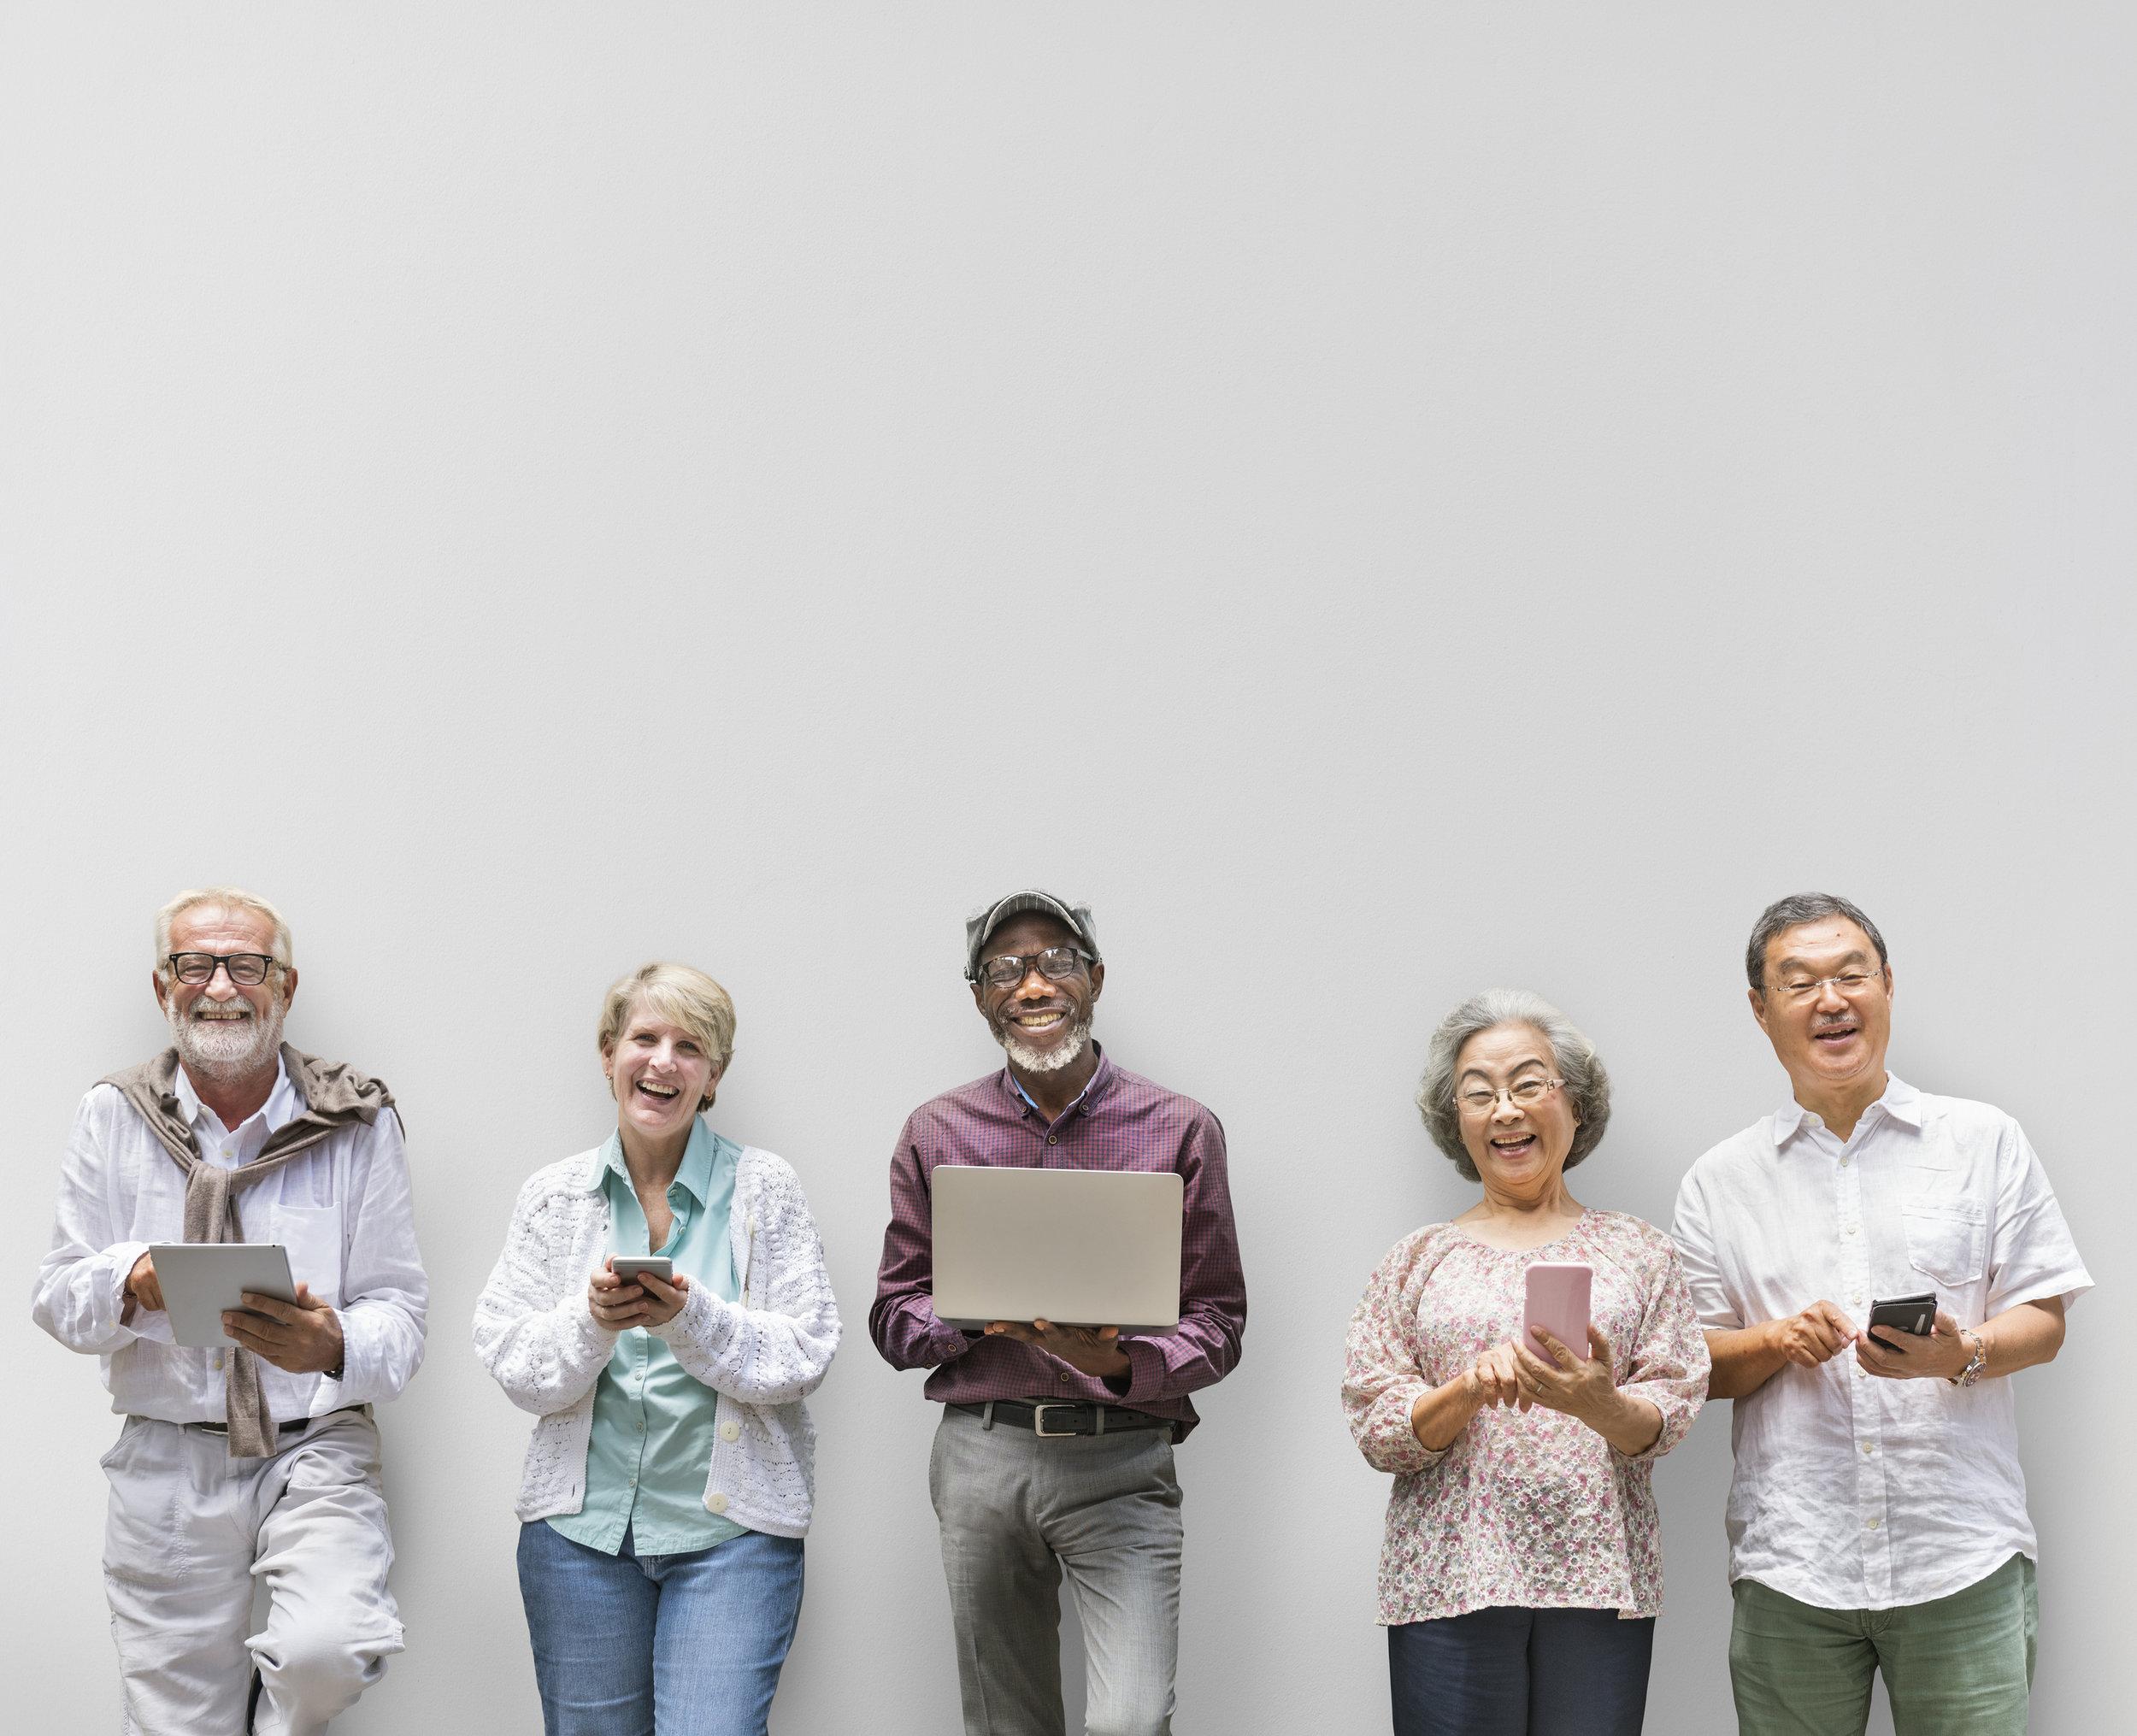 Retirement:a chance at a new beginning - a chance at a new beginning